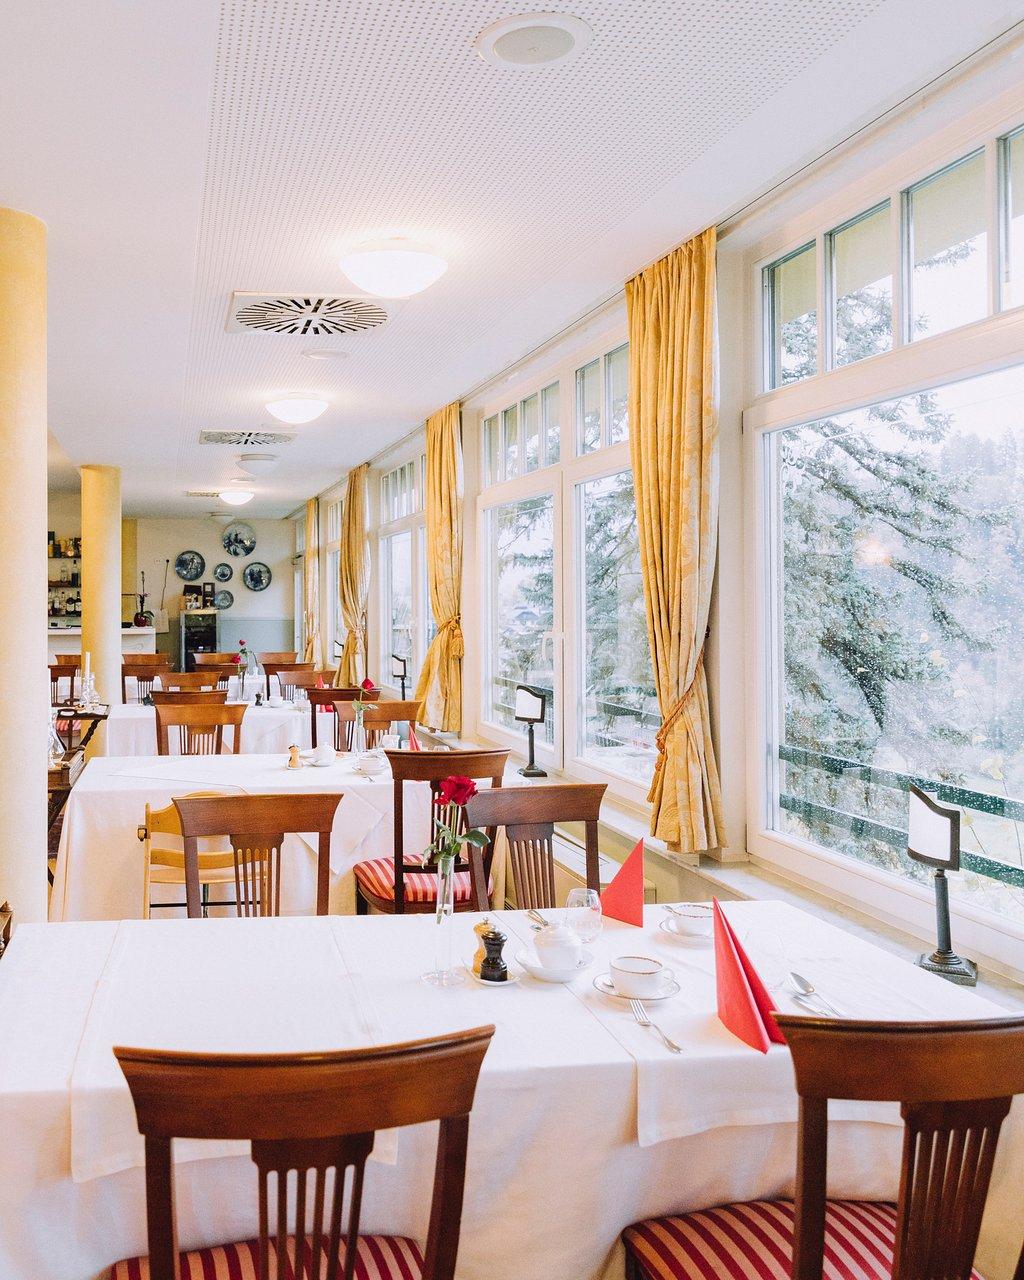 HOTEL TRIGLAV BLED Updated 2018 Prices